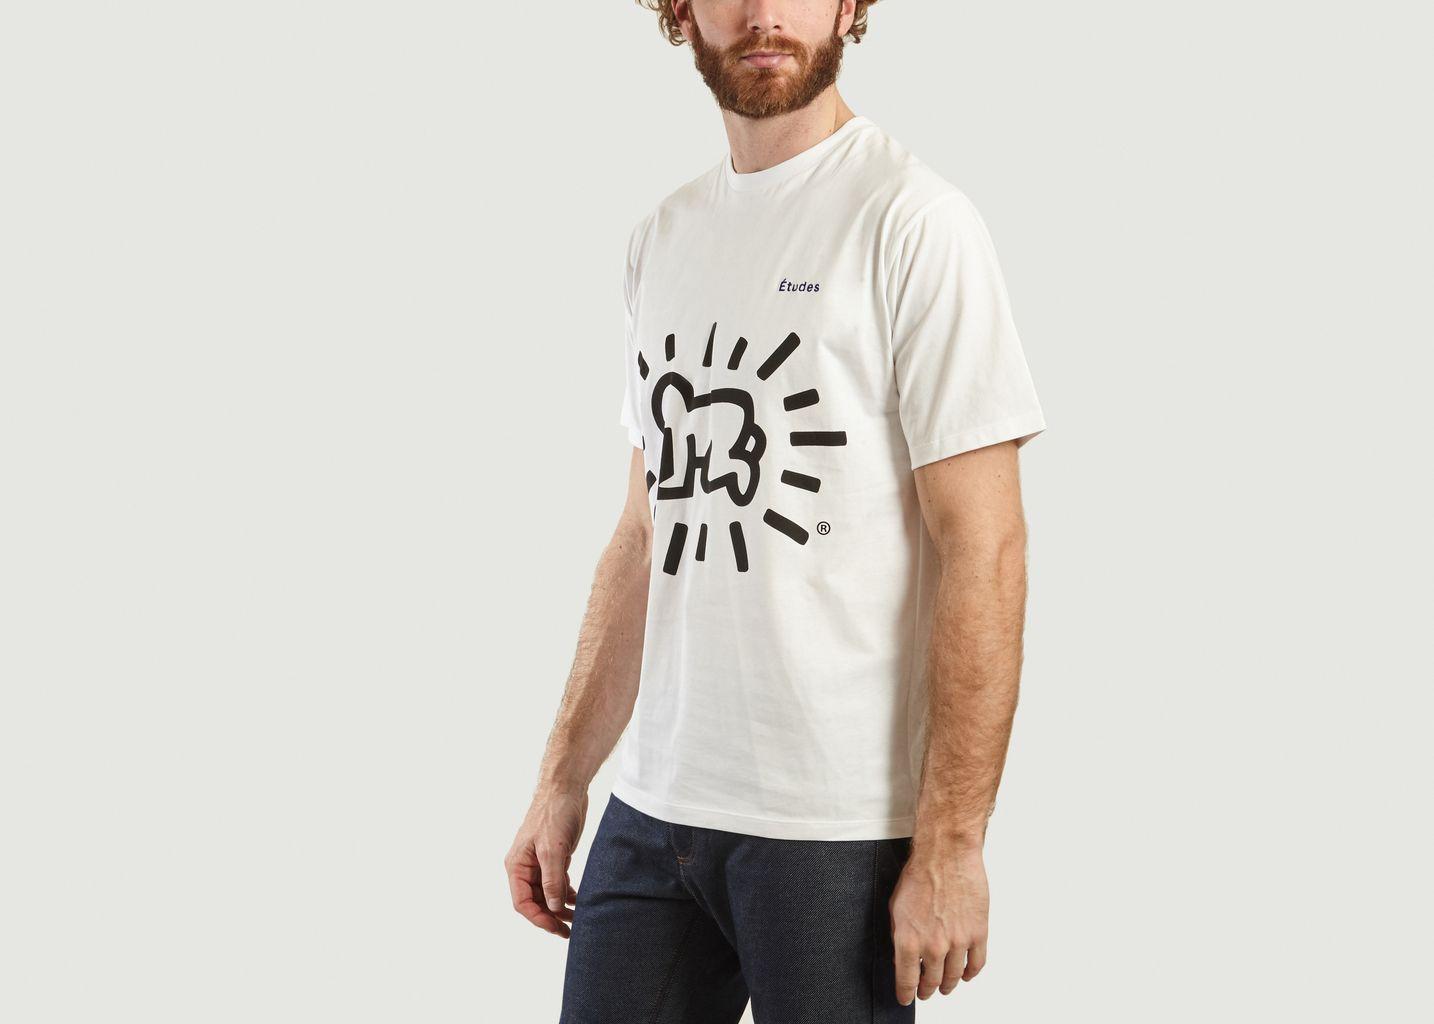 T-Shirt Wonder Etudes x Keith Haring - Études